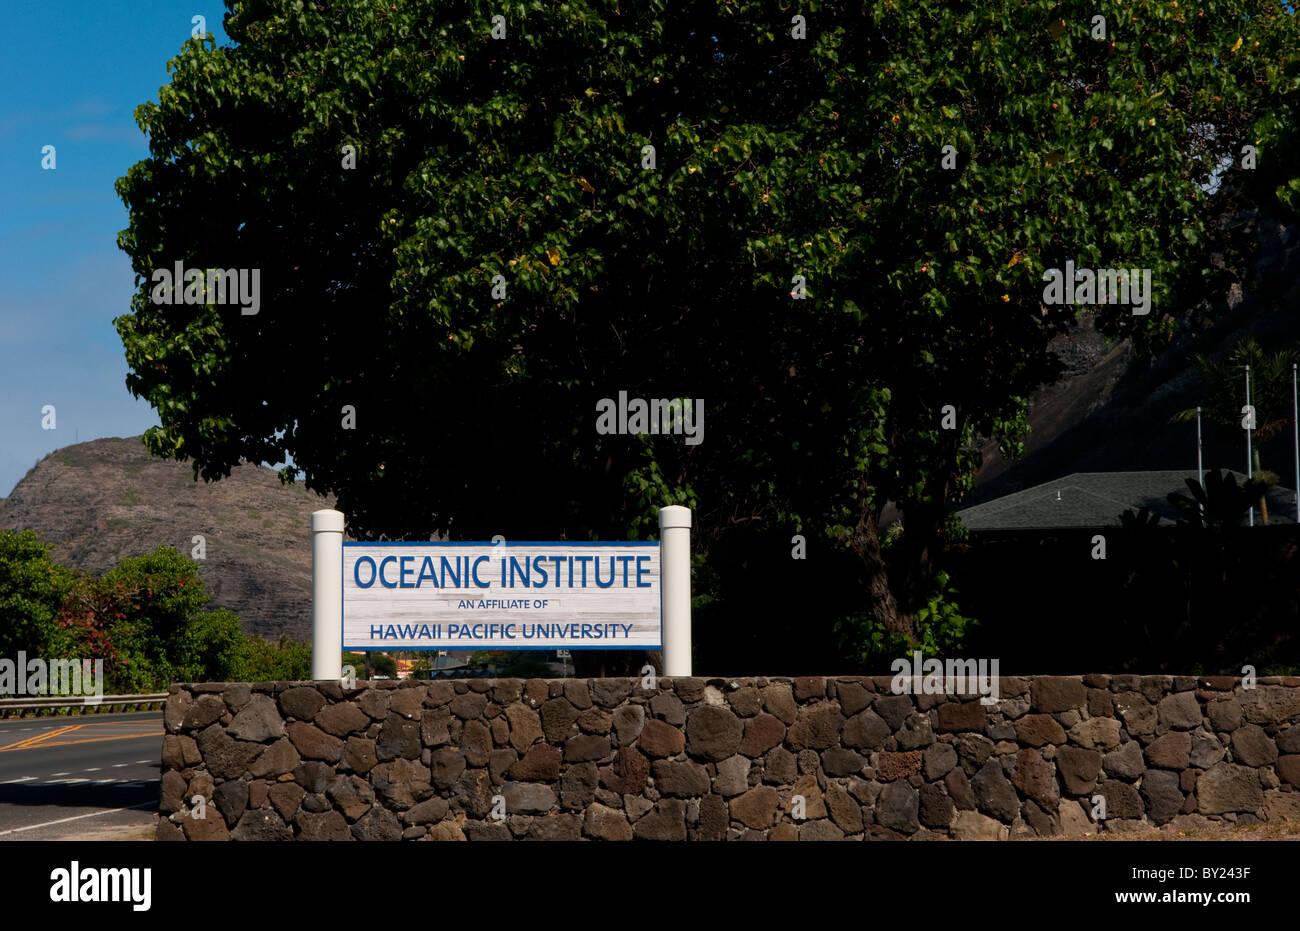 Hawaii Honolulu Oceanic Institute of Hawaii Pacific University - Stock Image